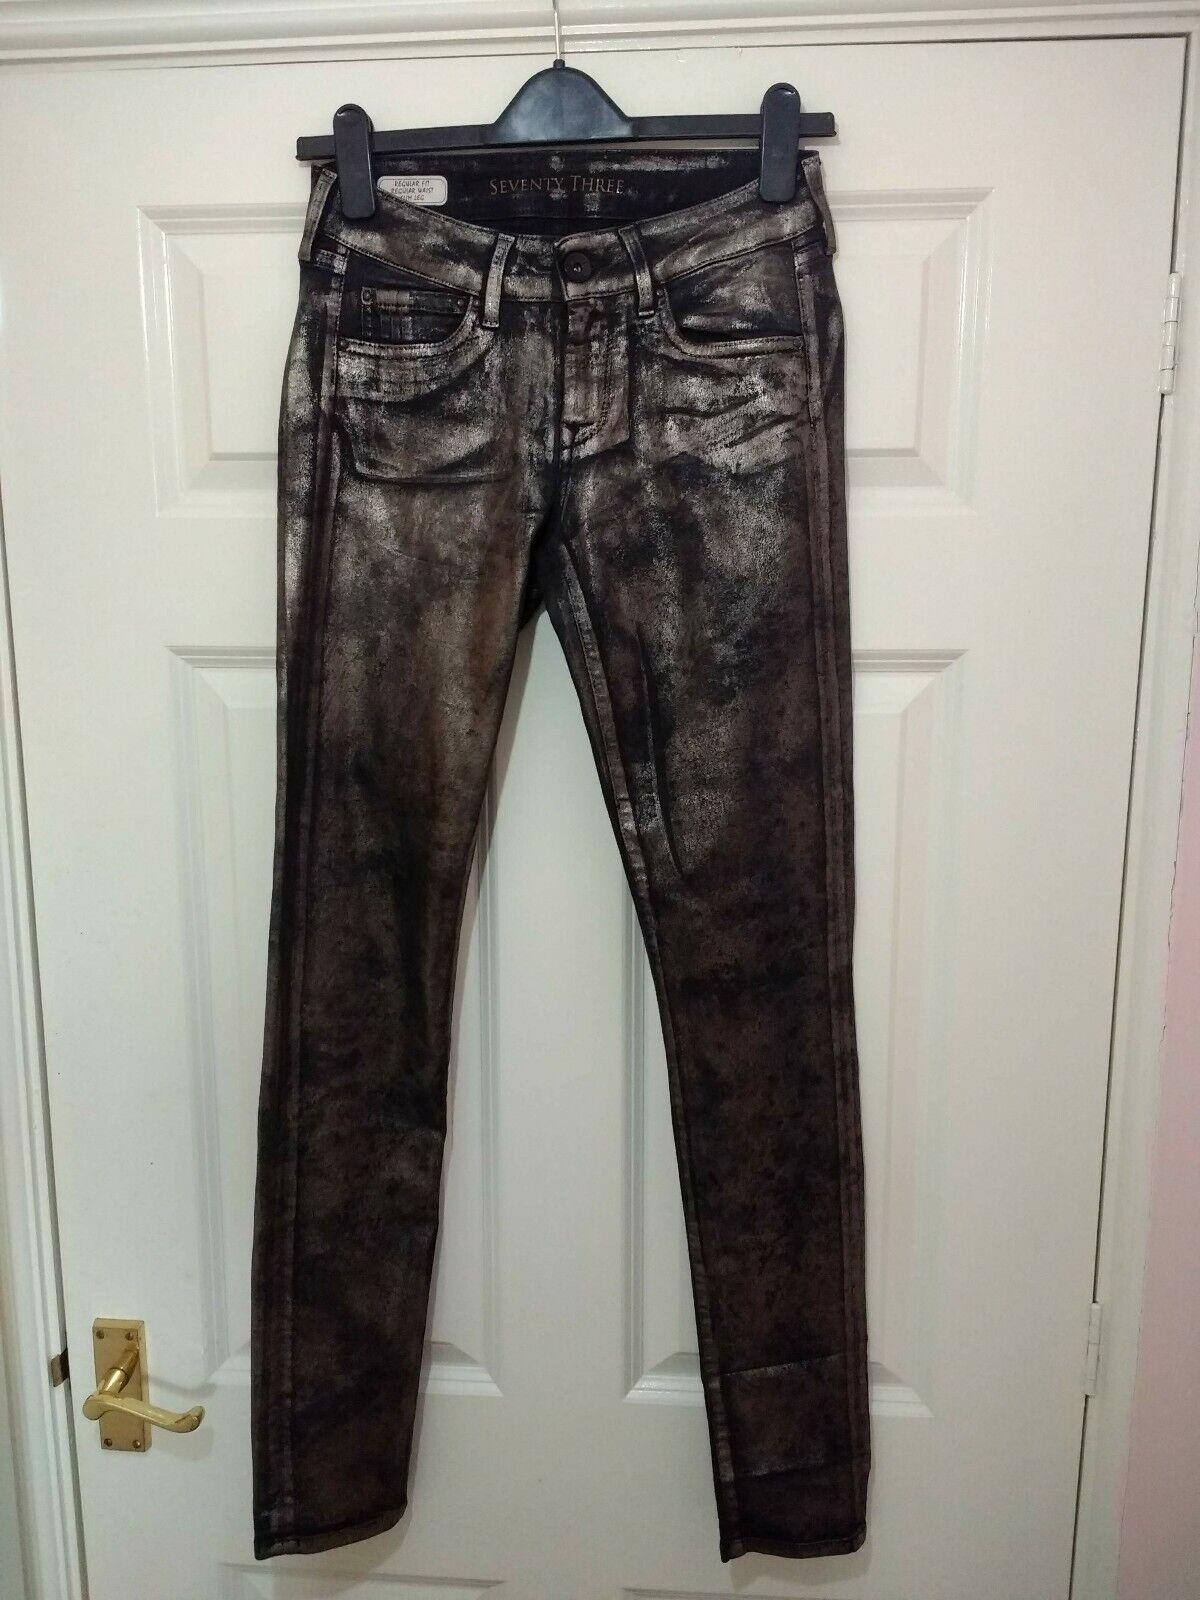 3b6a3bd41ea29 Rare Seventy Three Pepe Jeans Bronze Metallic Jeans Regular Fit Slim Leg